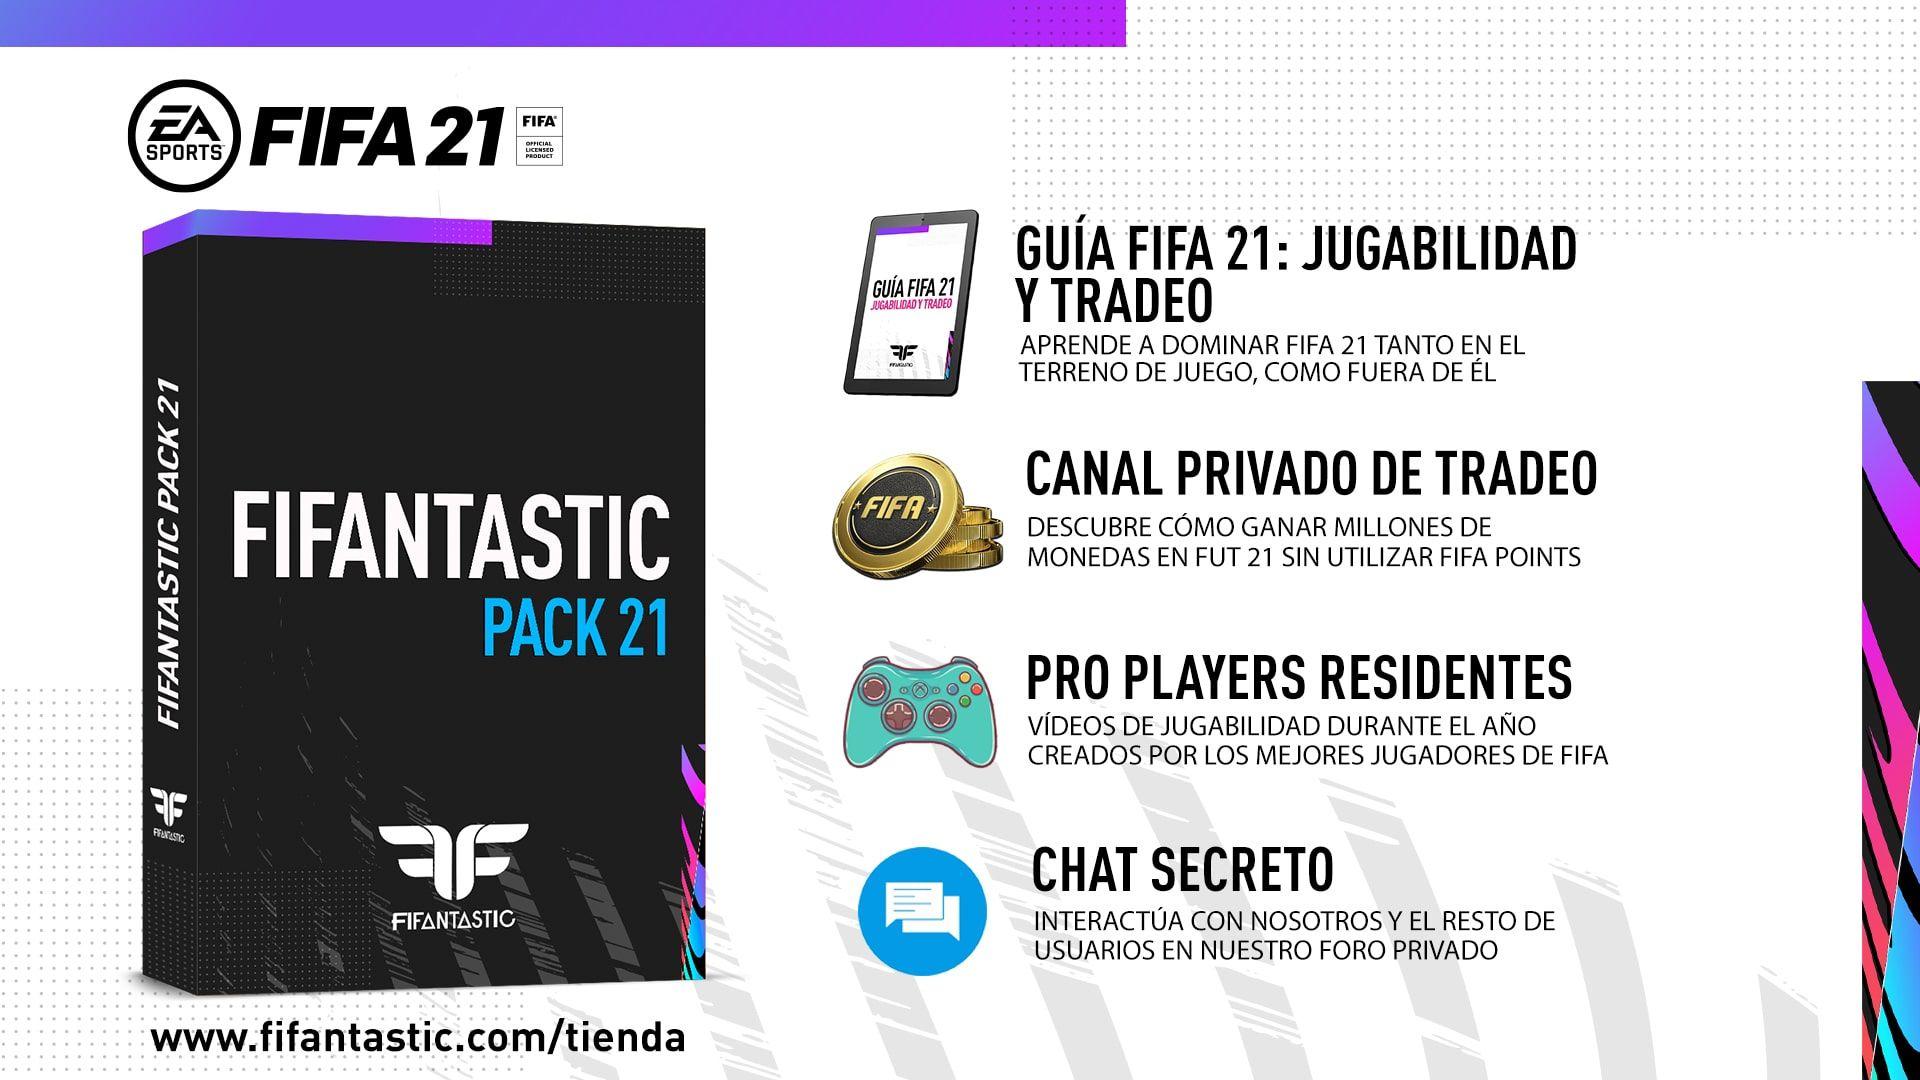 Contenido FIFAntastic Pack 21